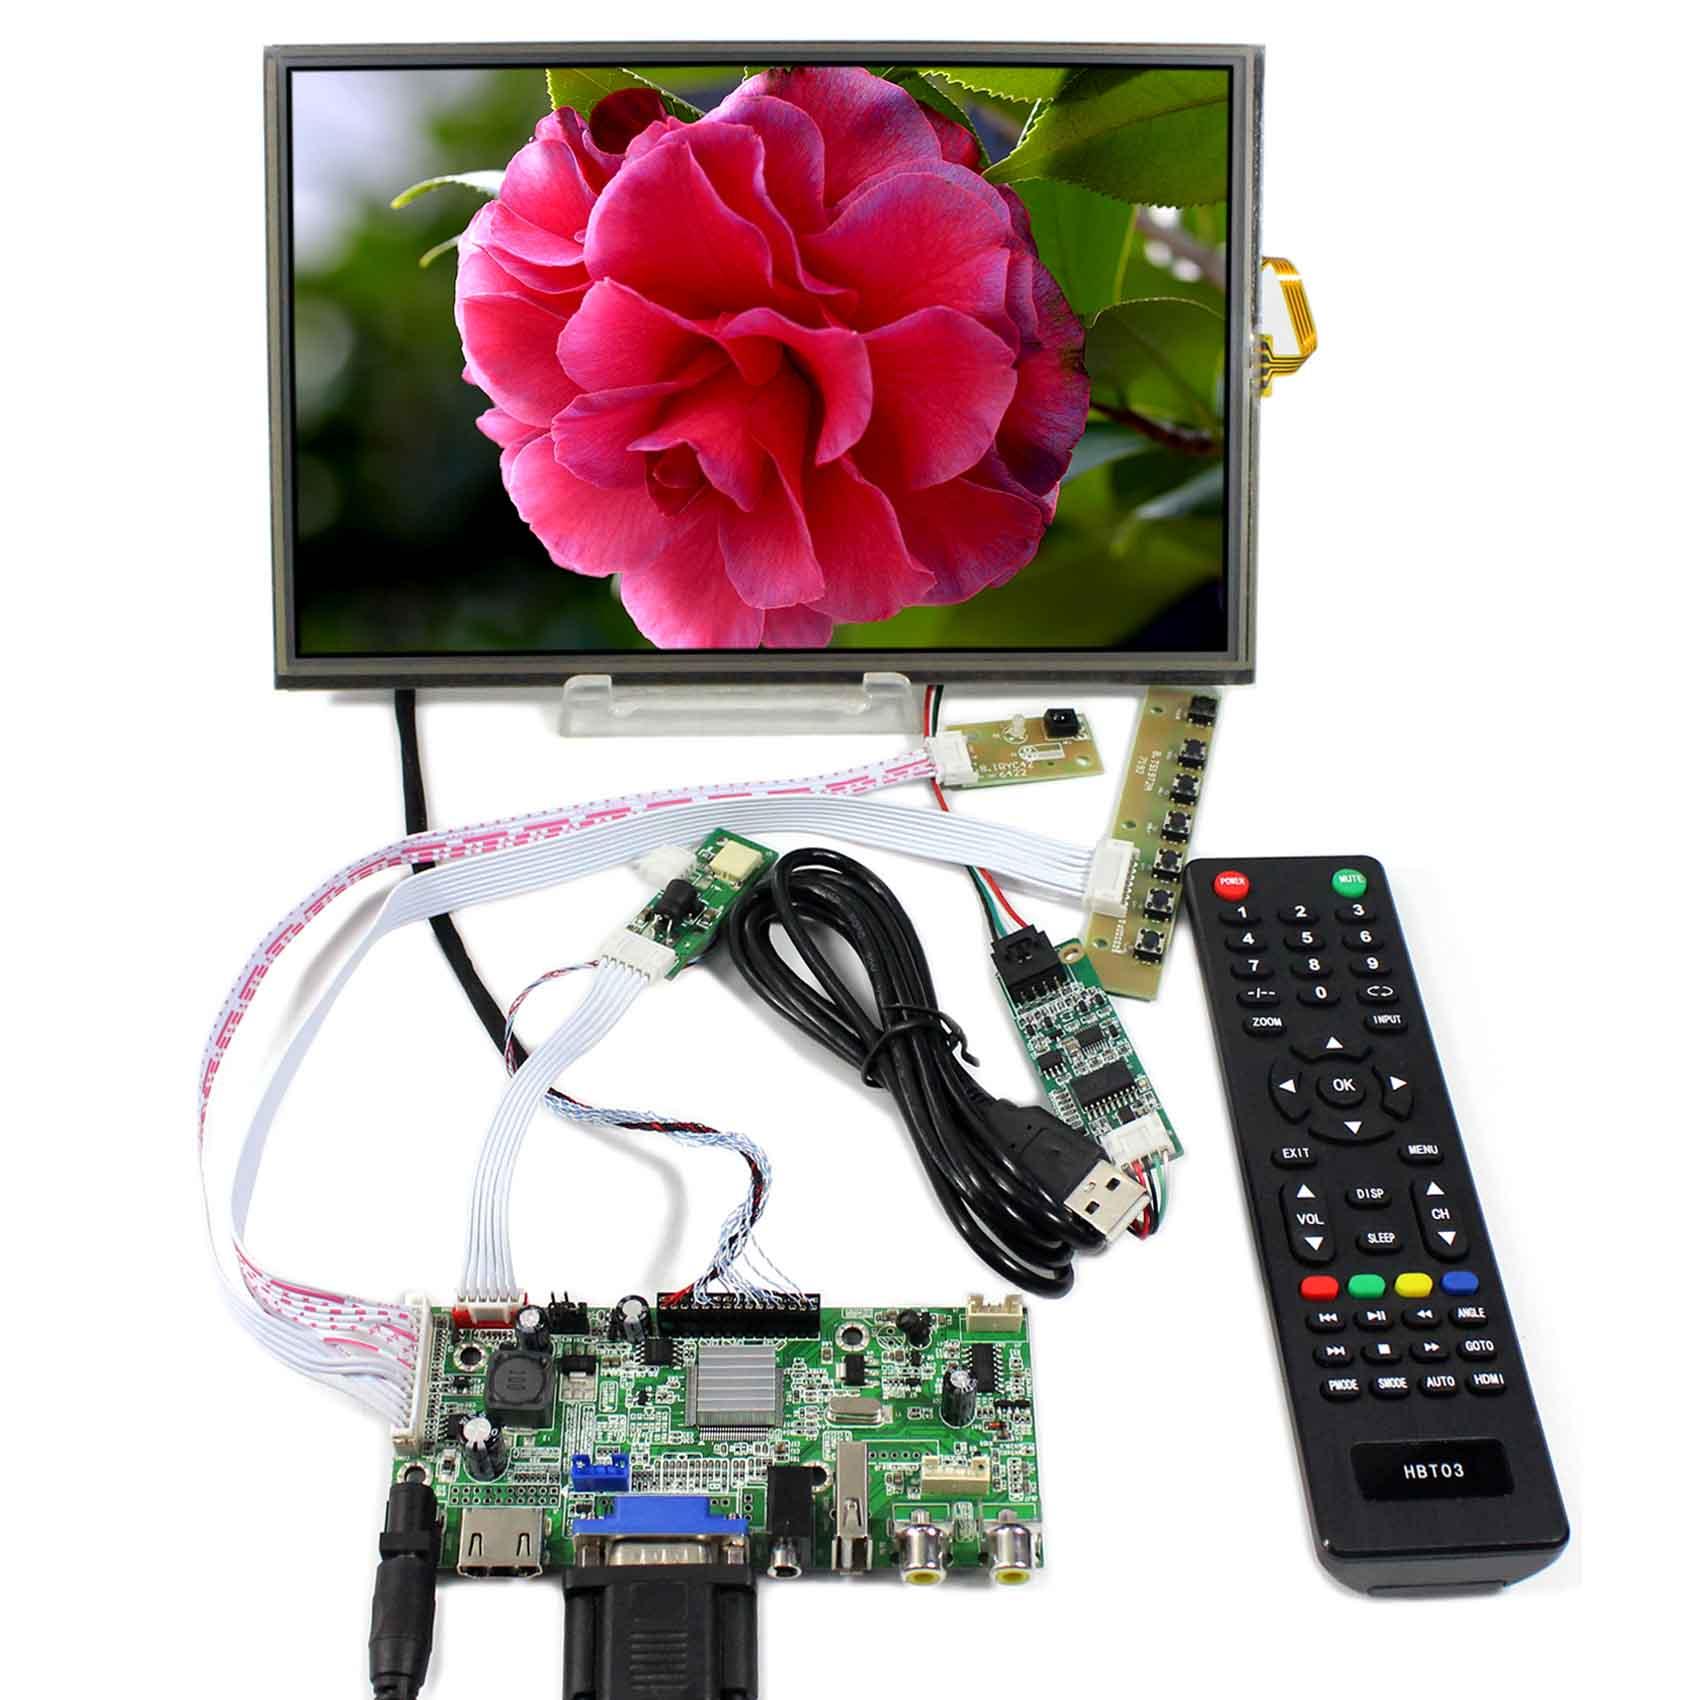 HDMI+VGA+AV+Audio+USB LCD Controller Board With 10.1inch 1920x1200 B101UAN02.1 Touch PanelHDMI+VGA+AV+Audio+USB LCD Controller Board With 10.1inch 1920x1200 B101UAN02.1 Touch Panel